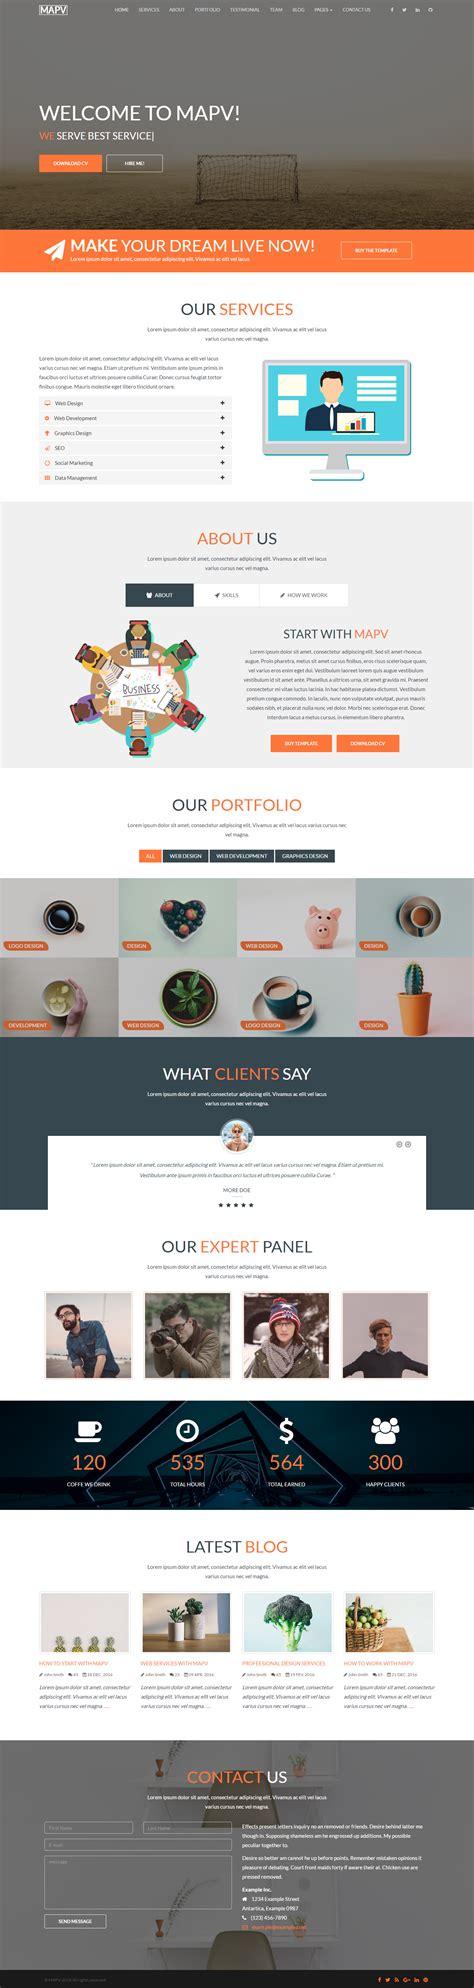 responsive portfolio templates mapv responsive portfolio template by coderexperts